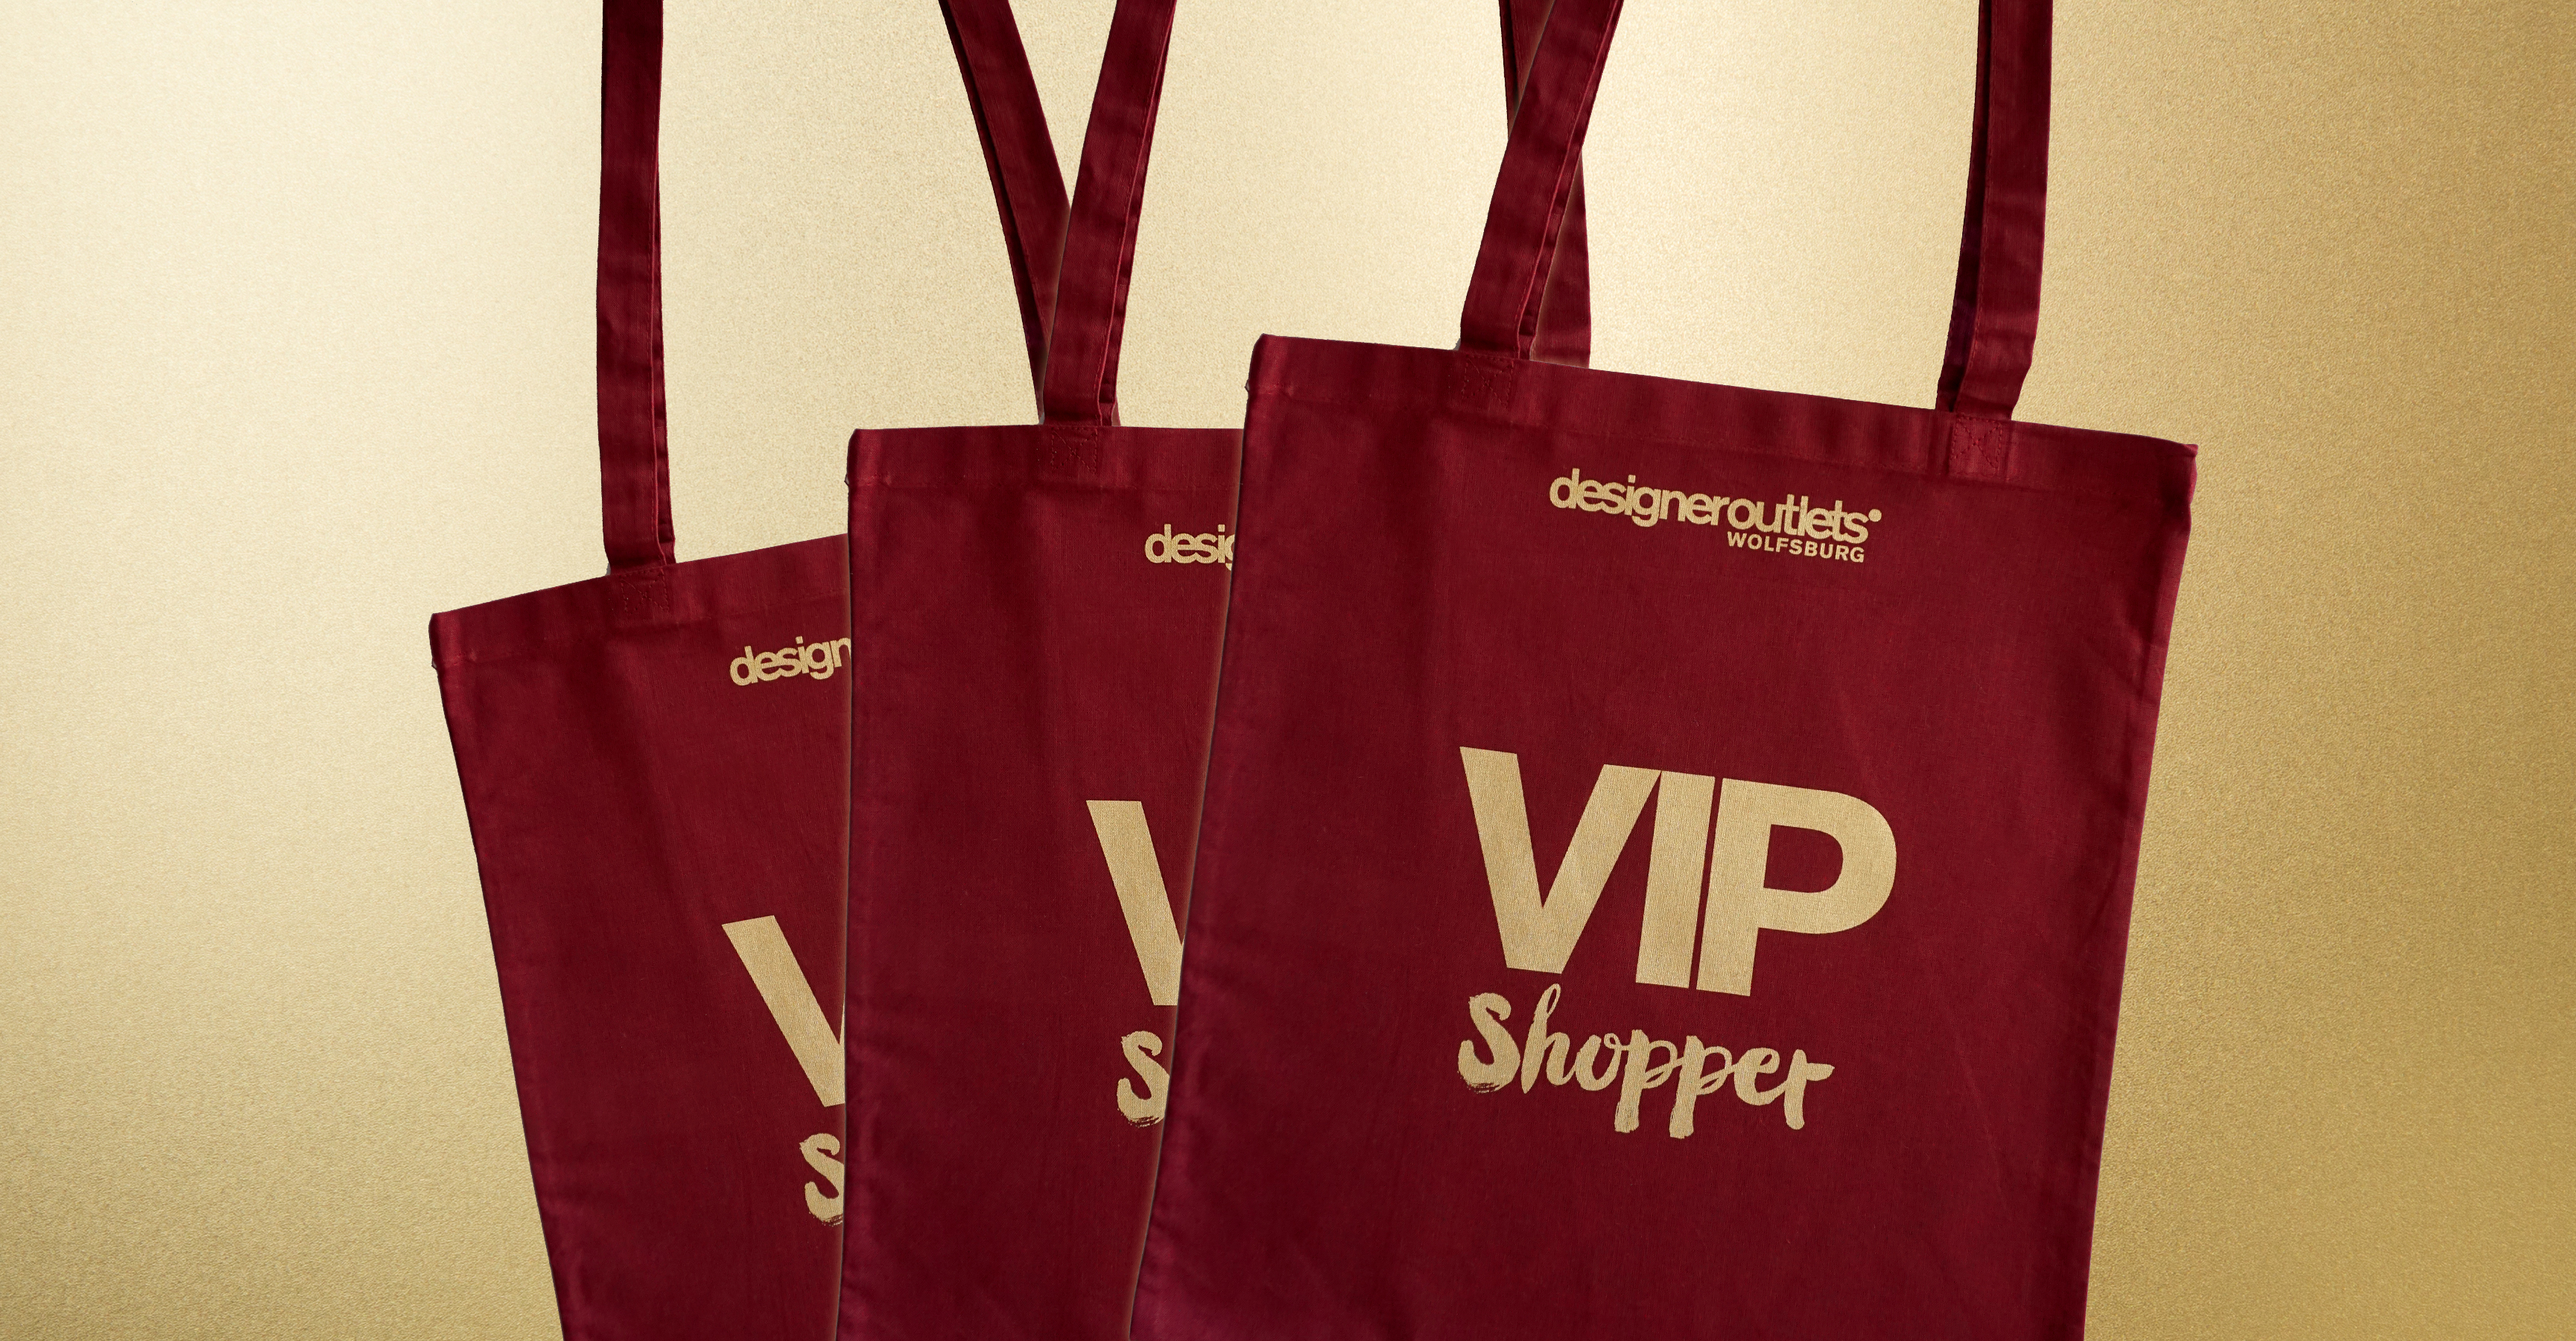 83554b54b2af1e VIP SHOPPING  500 EXKLUSIVE GOODIE BAGS FÜR UNSERE VIPS